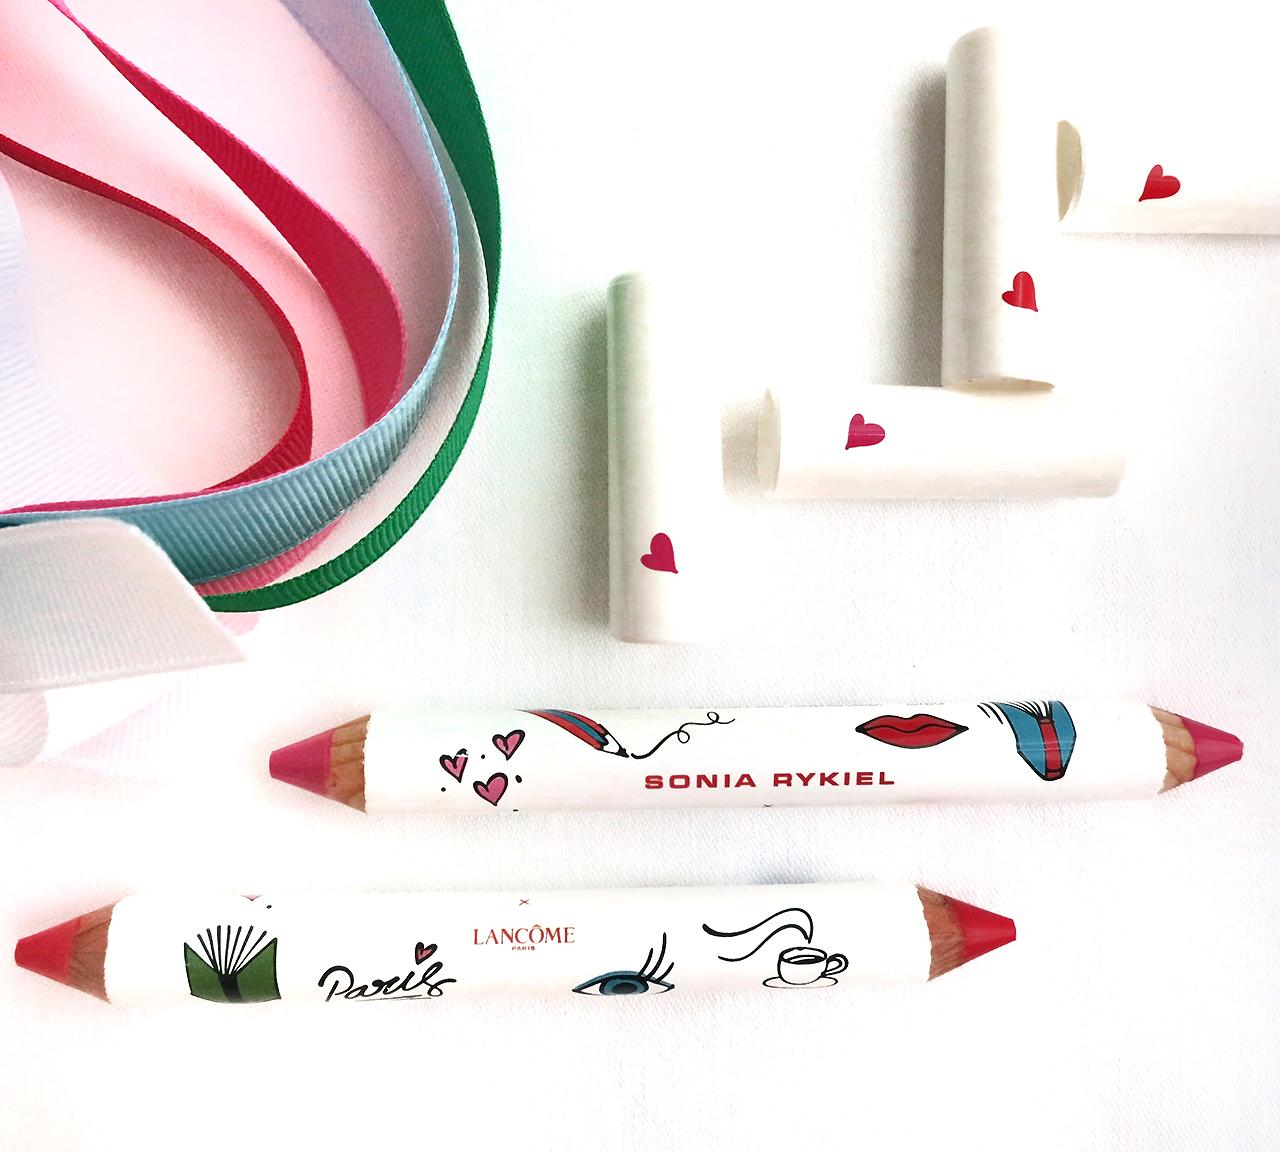 sonia-rykiel-x-lancome-parisian-lip-crayon-audace-spirit